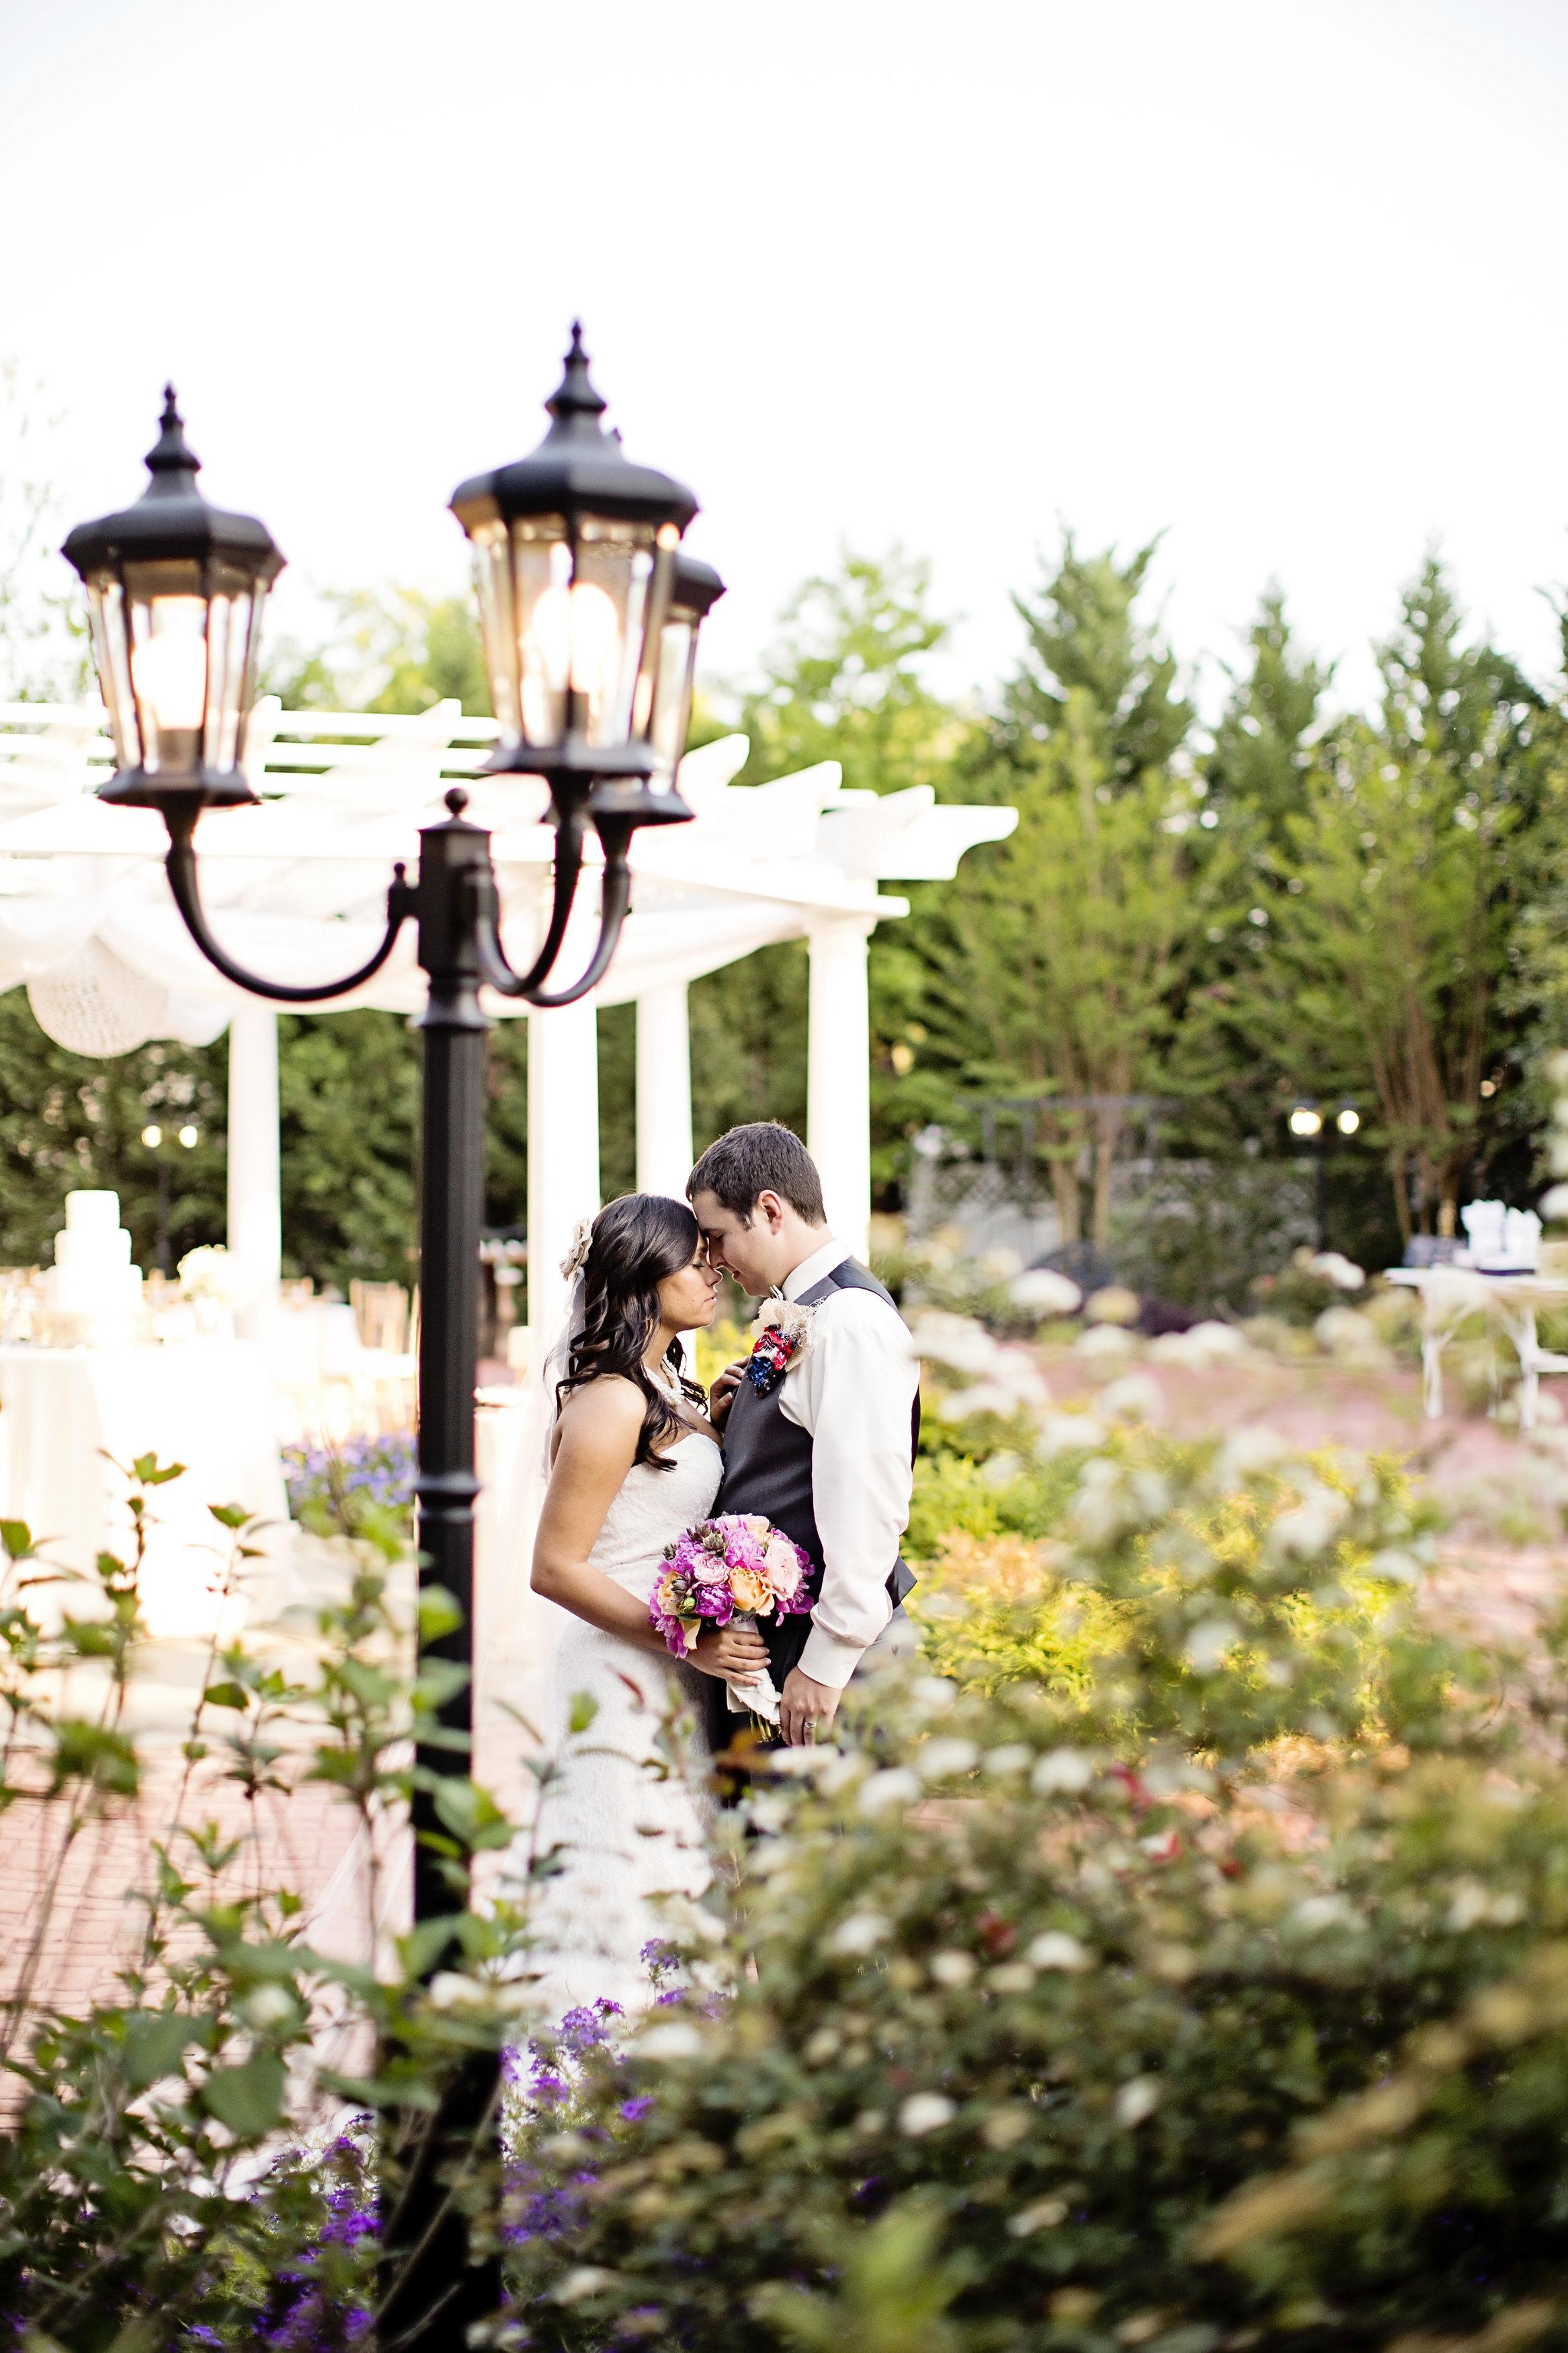 View More: http://jacquierives.pass.us/sydney--brett